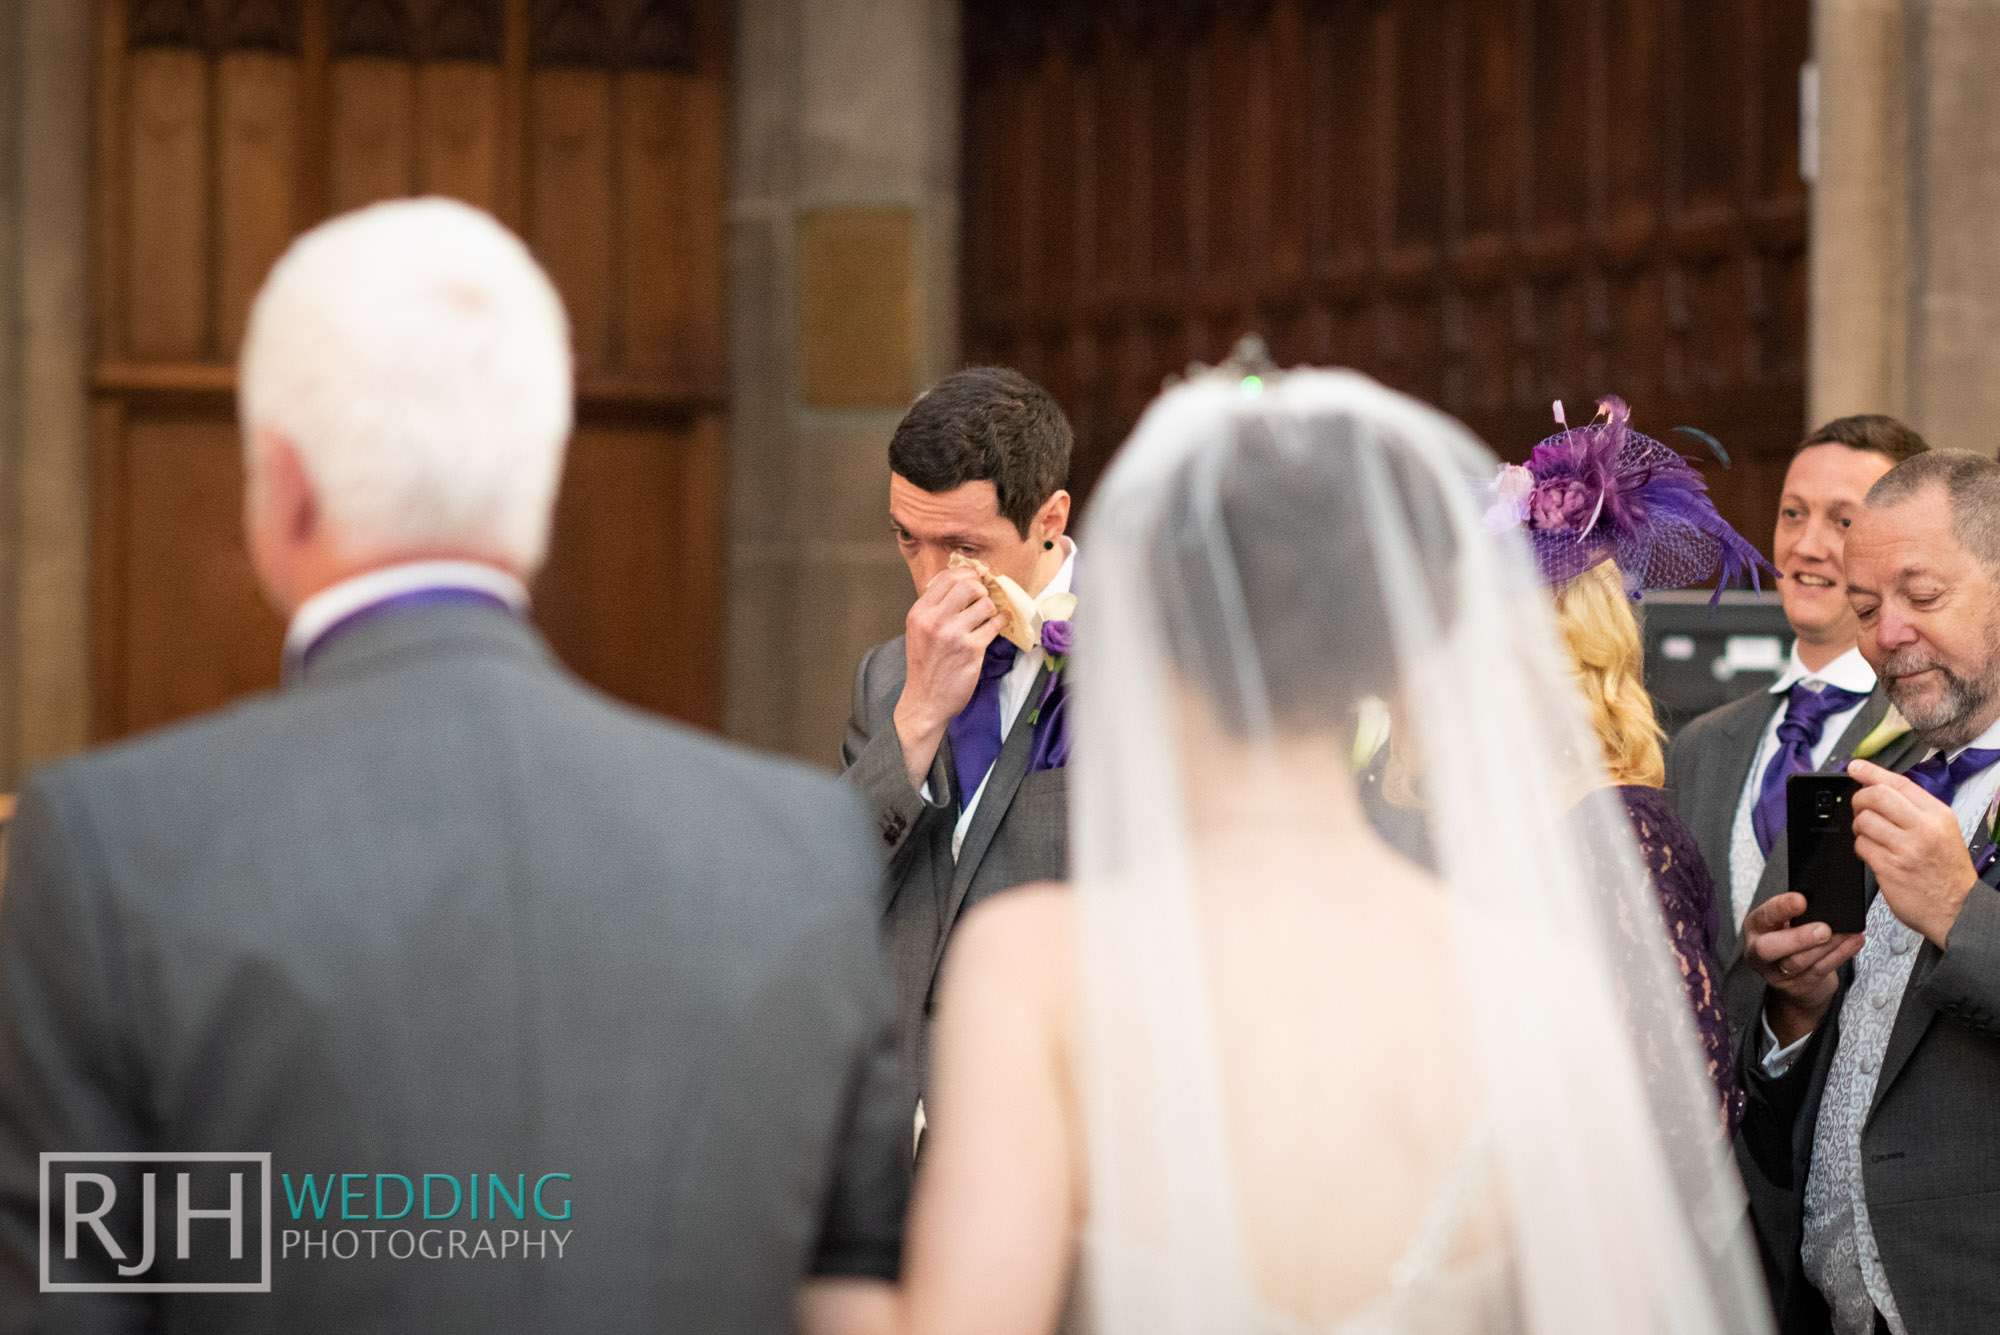 Oulton Hall Wedding Photography_Goodwill-Hall_021_DSC_3309.jpg